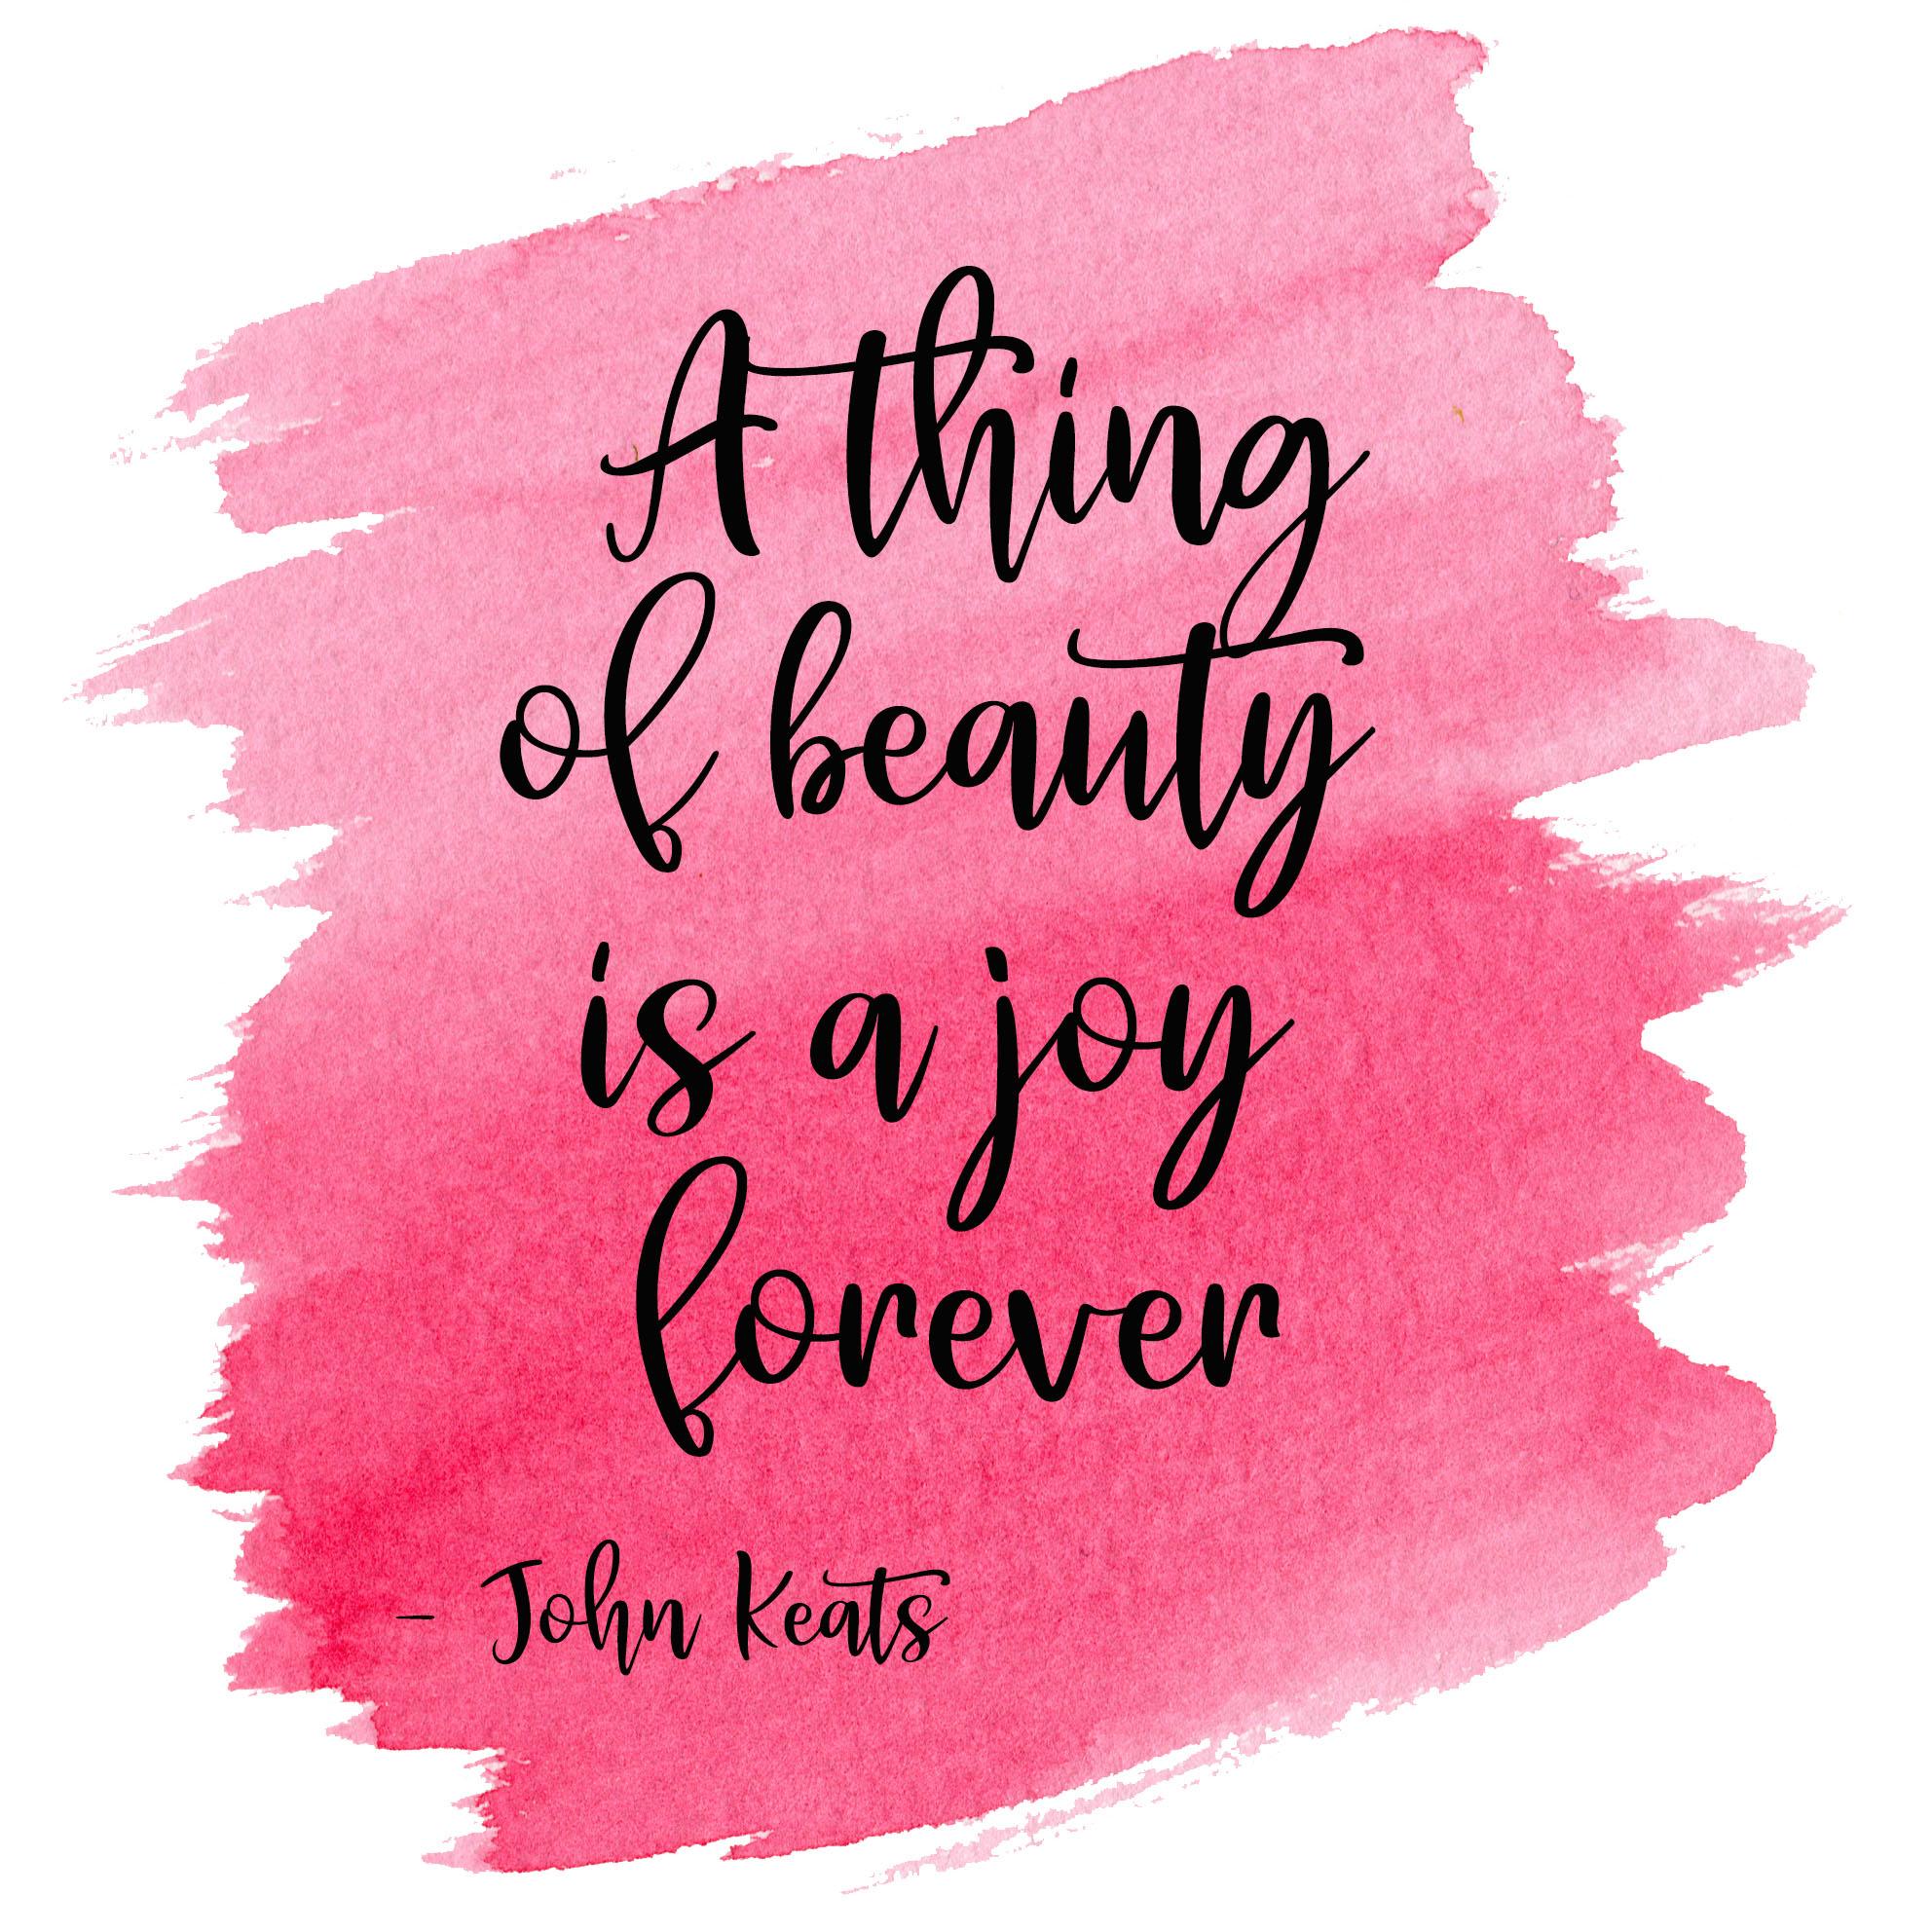 A thing of beauty is a joy forever. John Keats